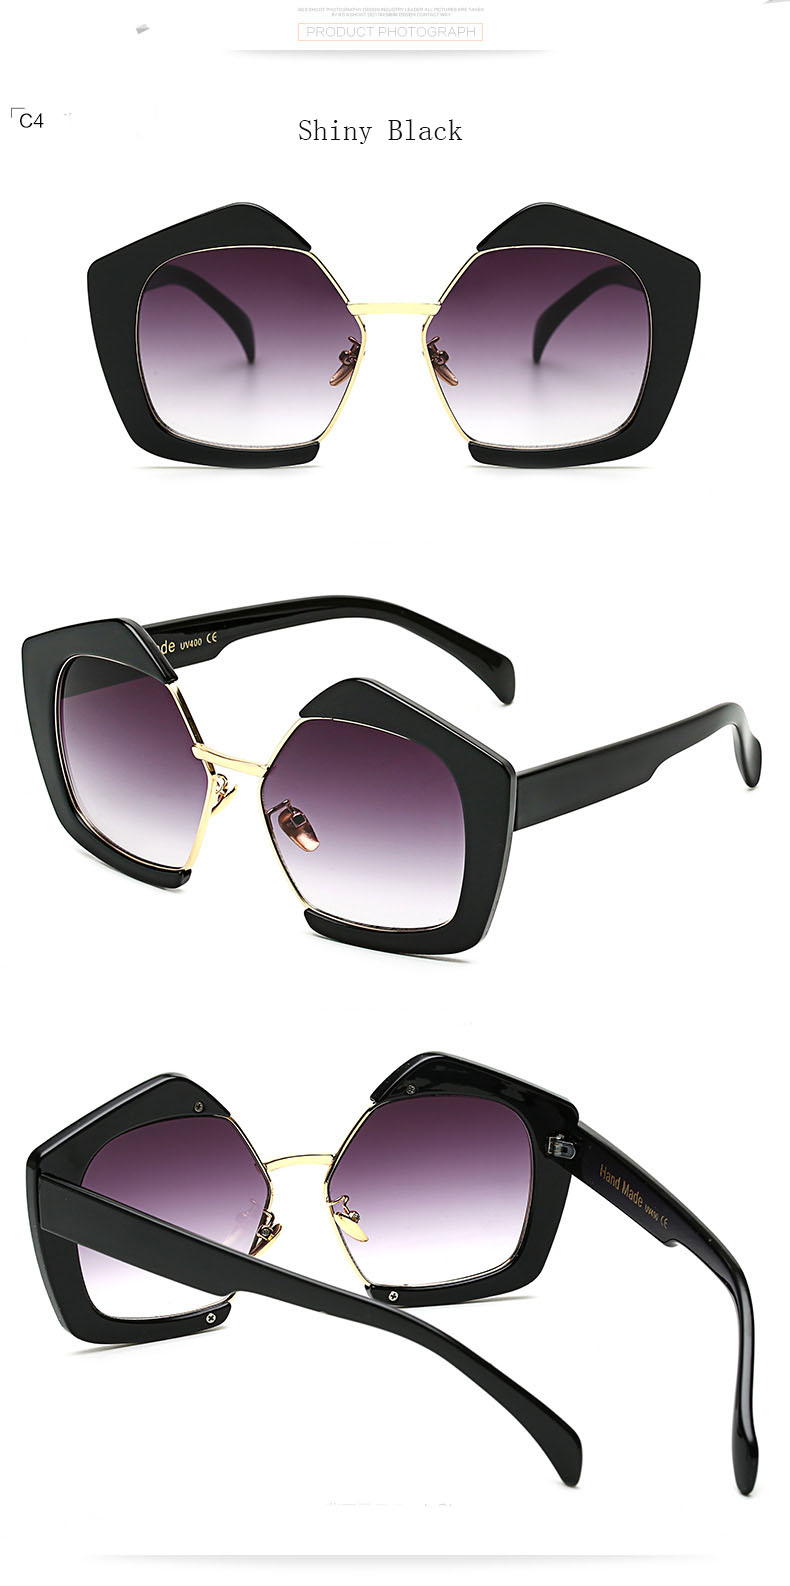 HTB1i0ZaPpXXXXaSXpXXq6xXFXXX2 - 2017 New Sunglasses Women Brand Designer Semi-Rimless Cat Eye Fashion Sun Glasses for Ladies Pink Oculos De Female Gafas